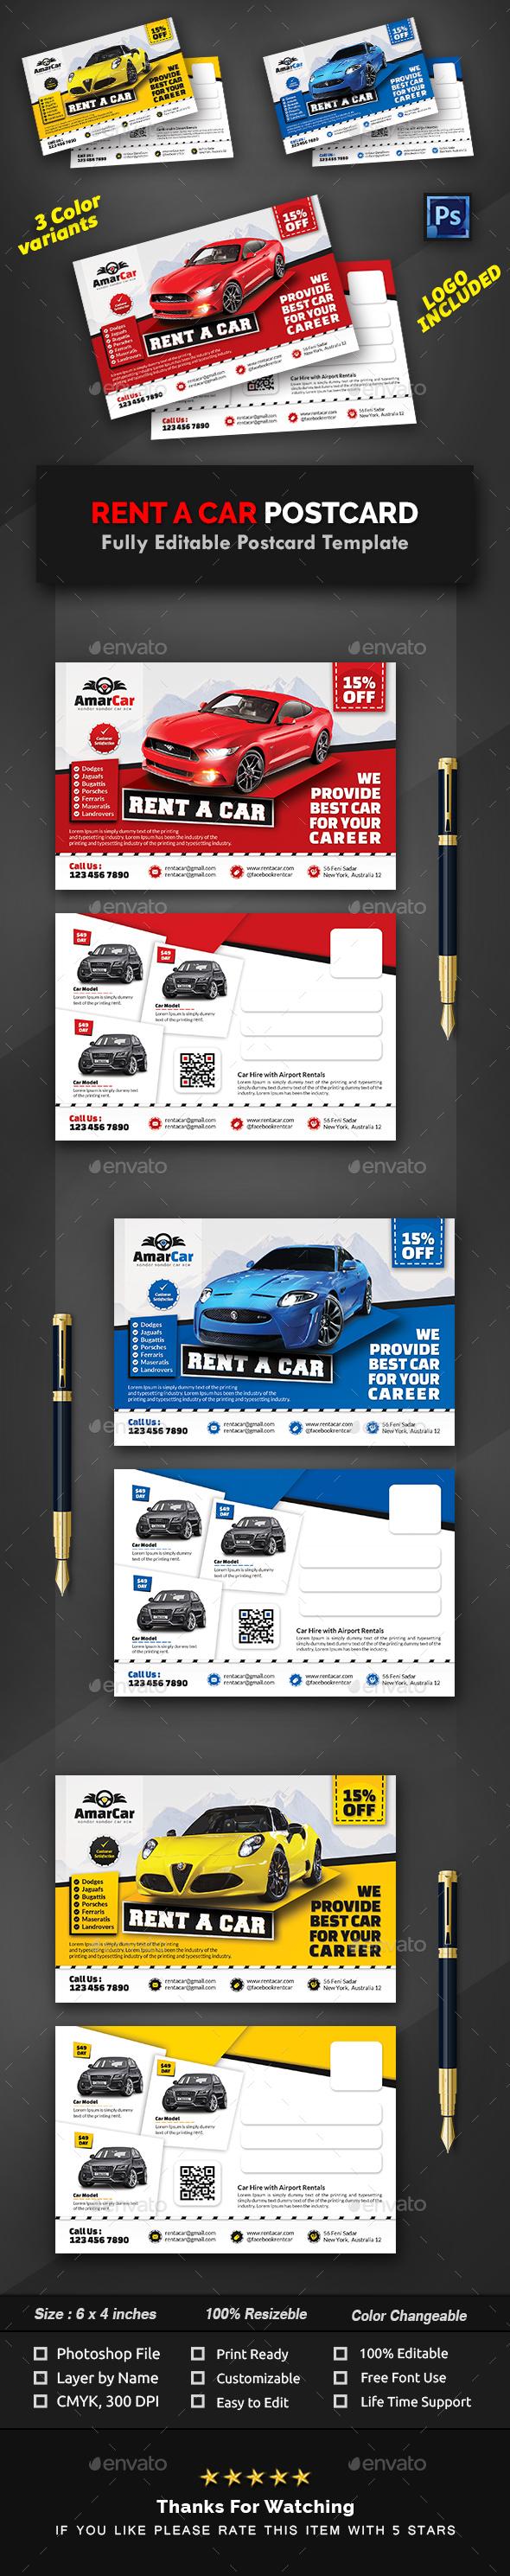 Rent a Car Postcard Template - Cards & Invites Print Templates